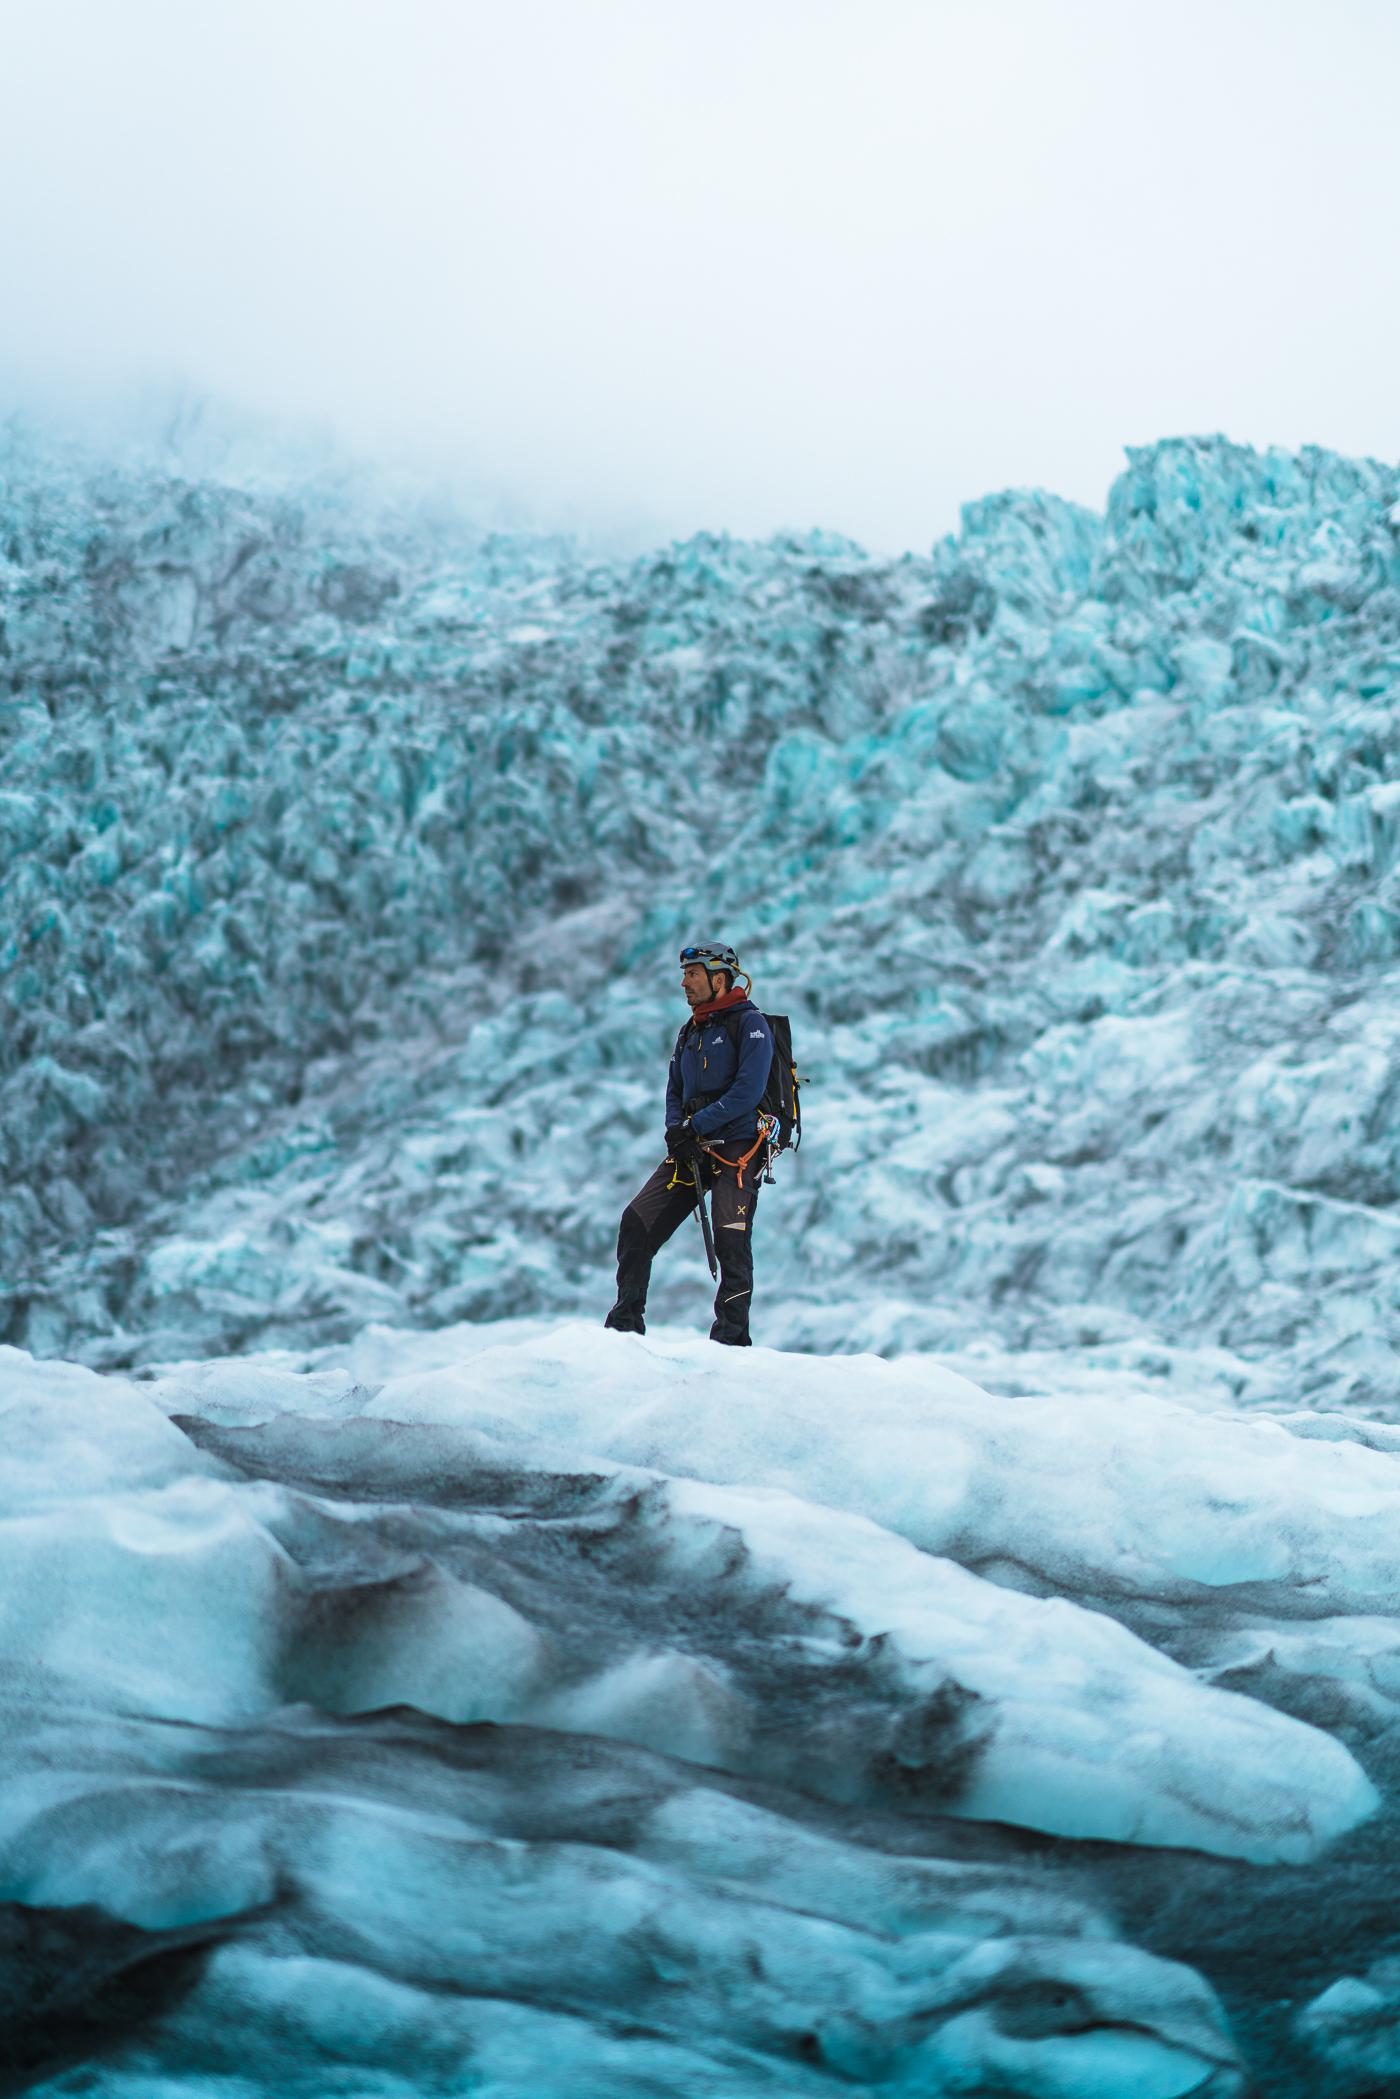 gabornagy_photography_iceland_glacier22.jpg